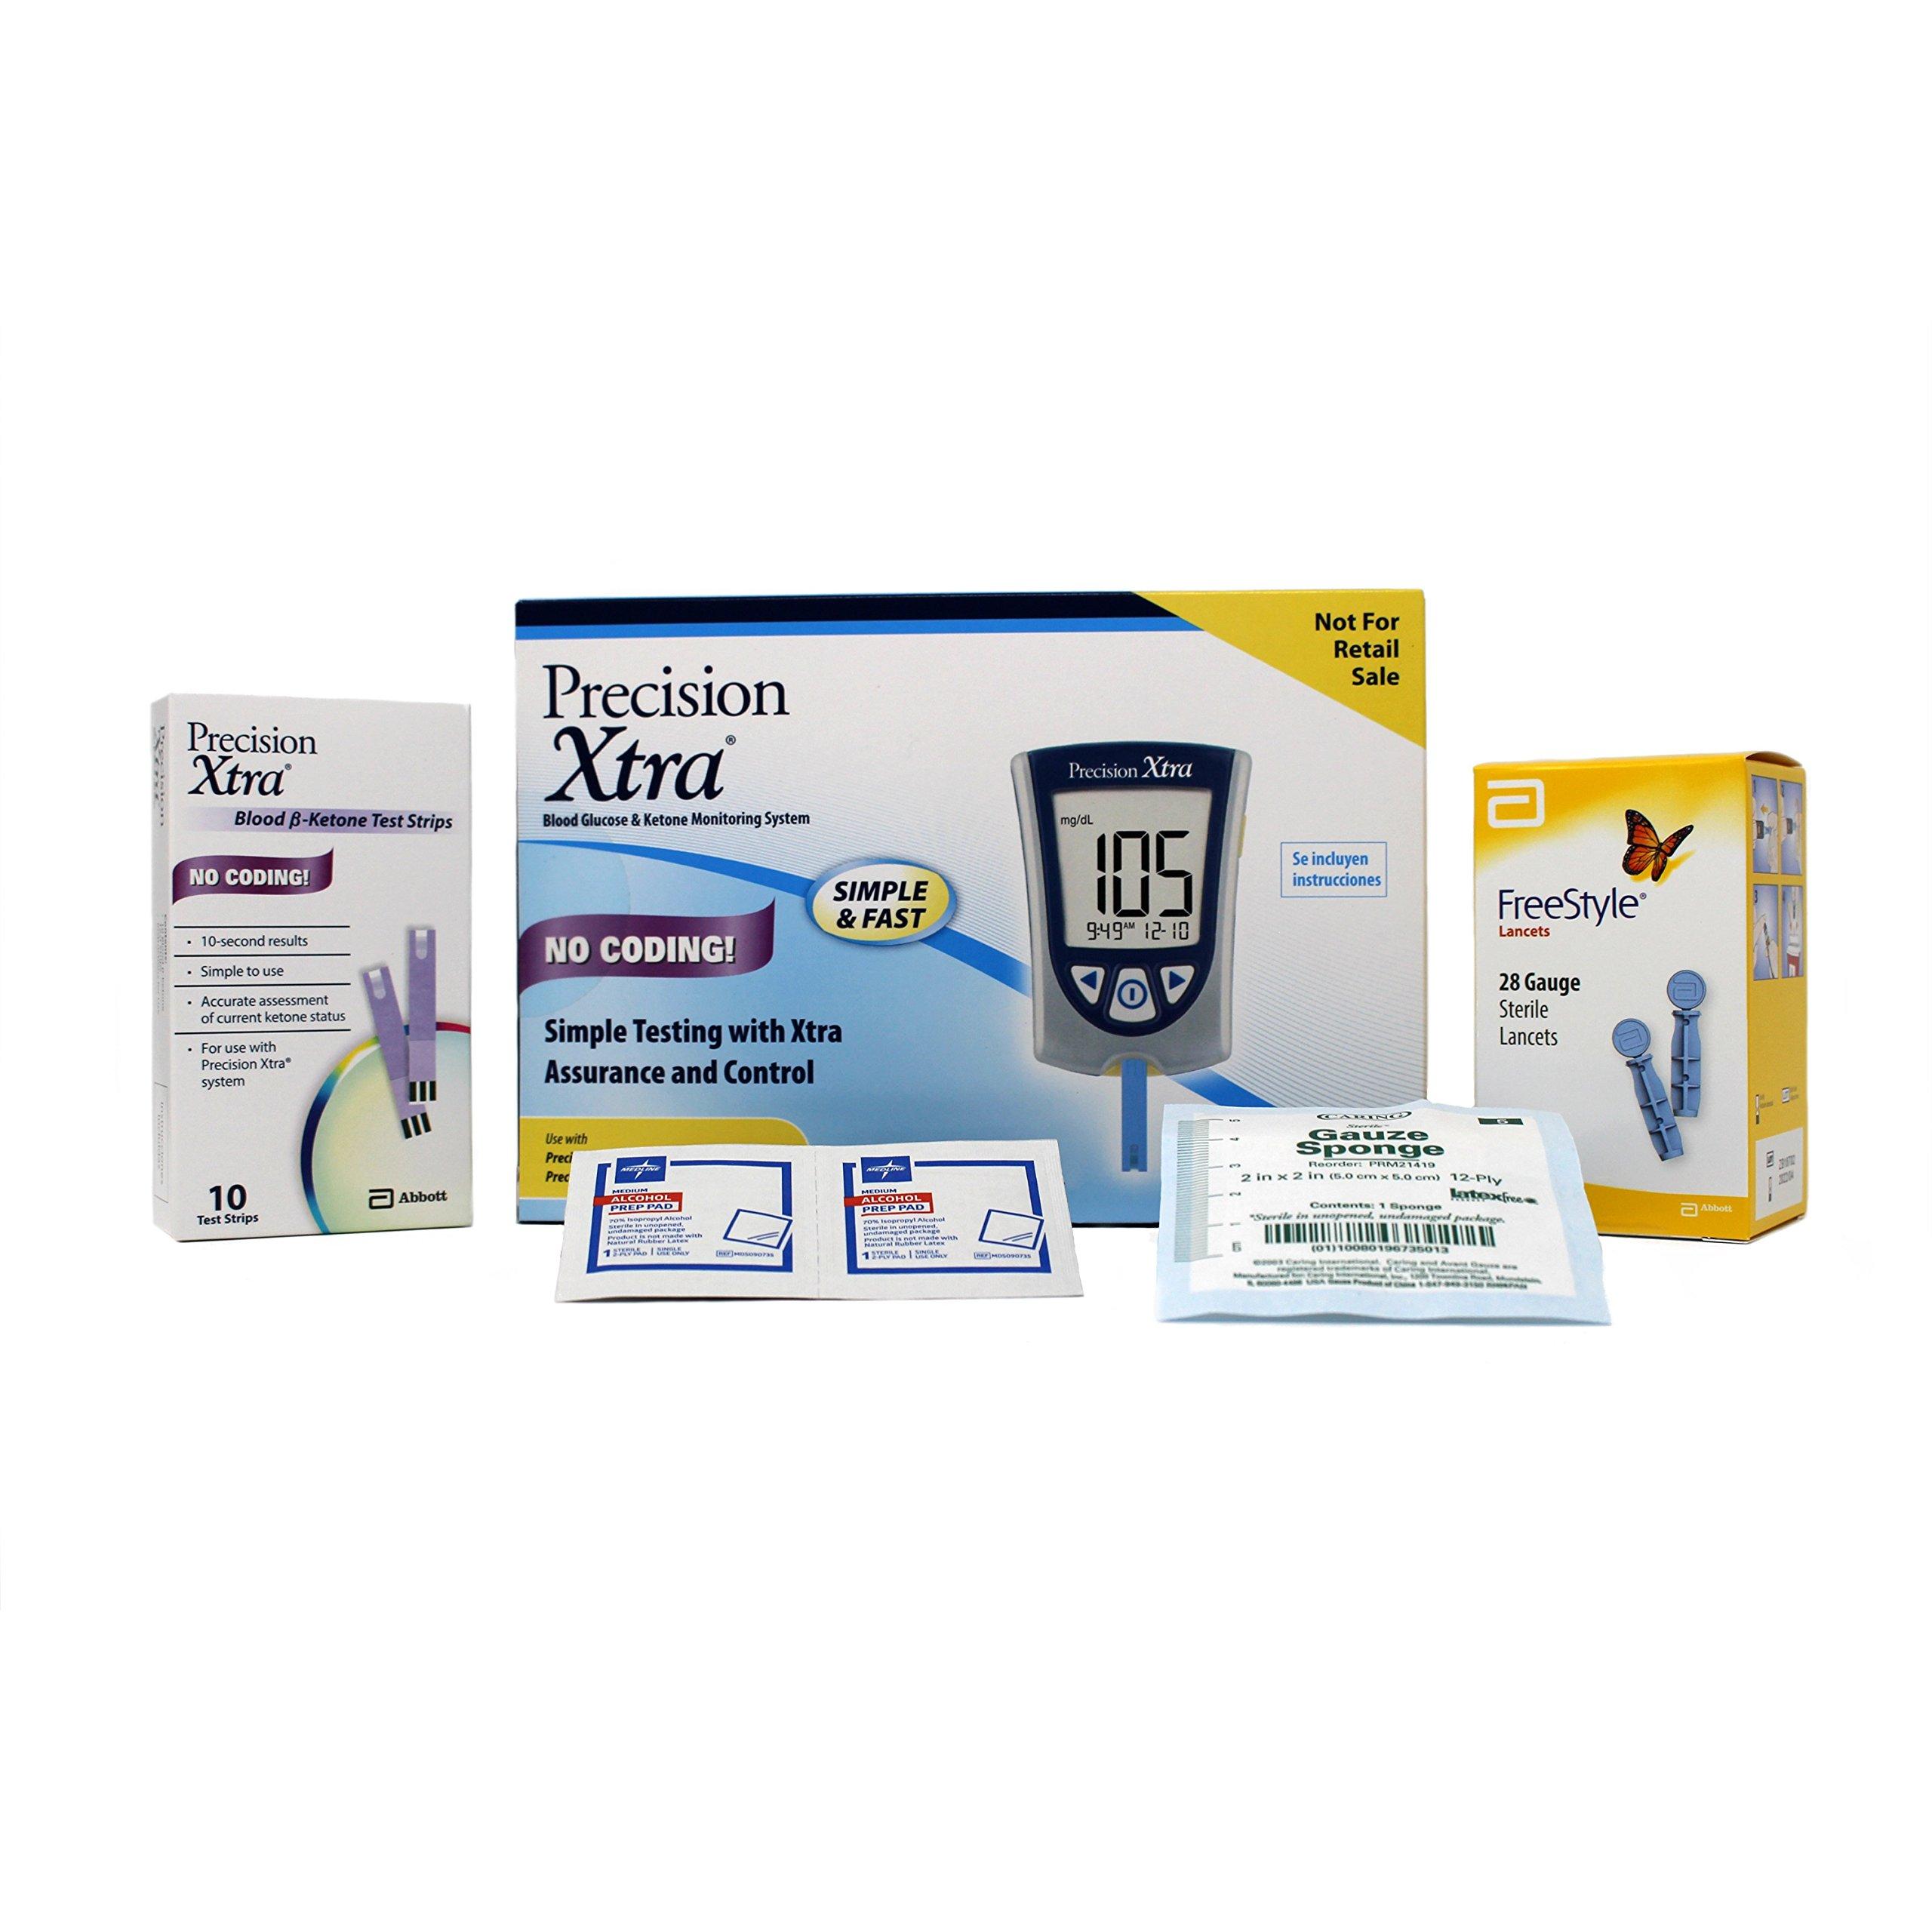 Zestra hormonal vaginal cream